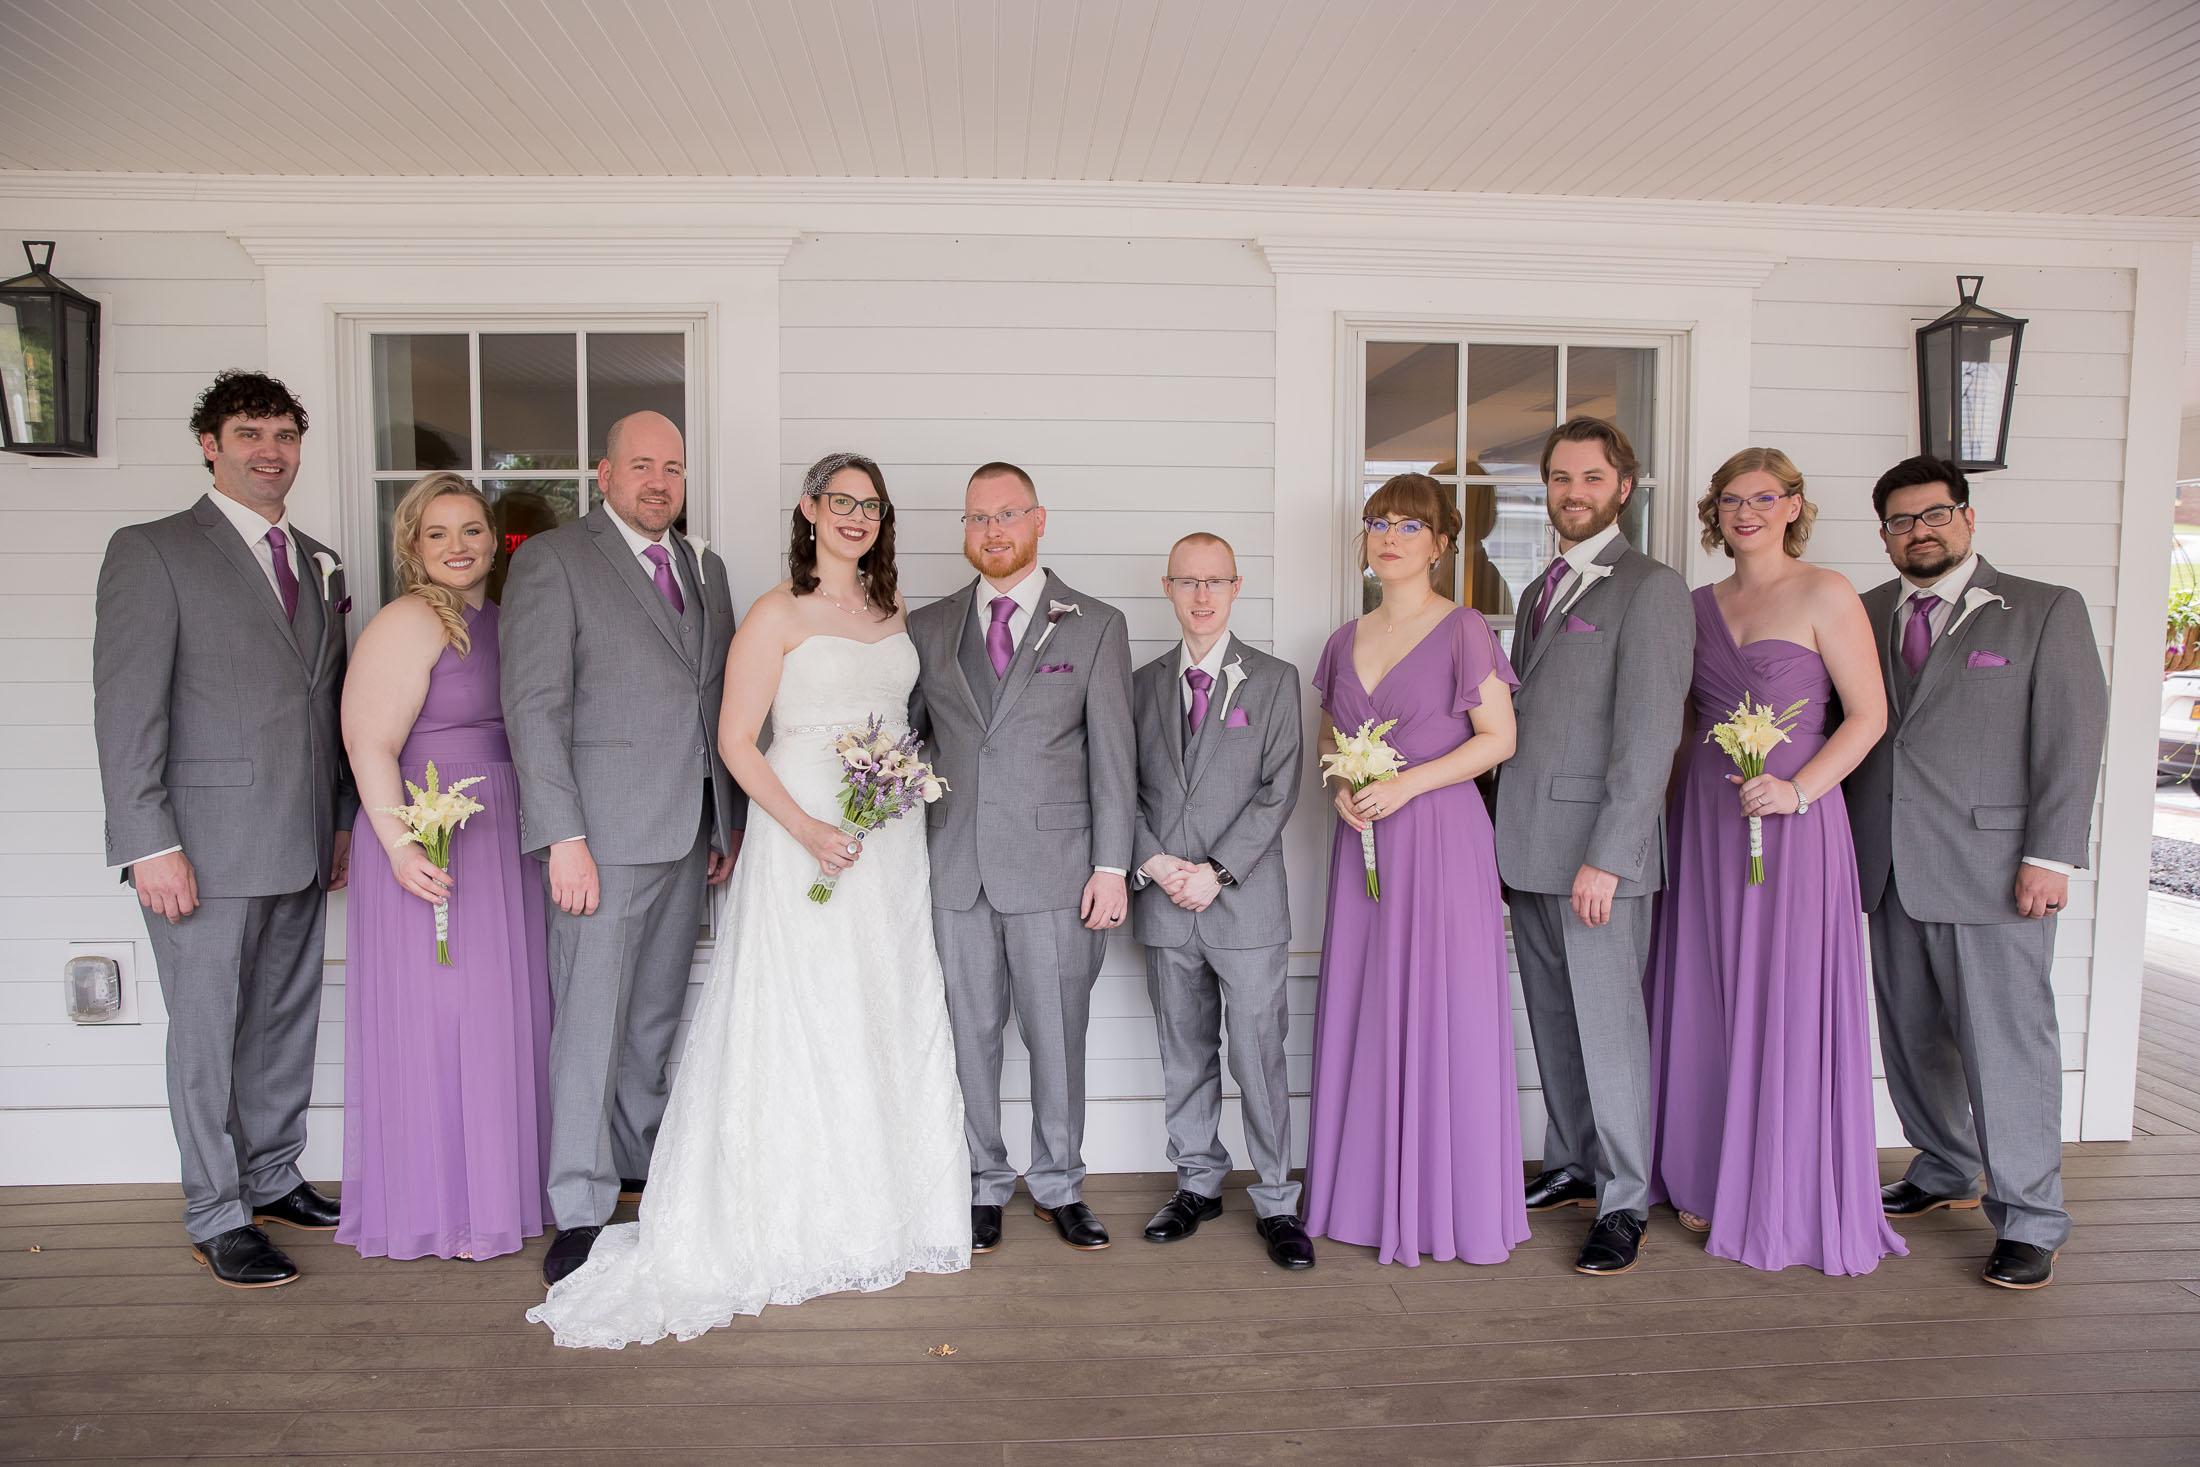 wedding party, wedding, tracy jenkins photography, publick house, Massachusetts, new england,  photography